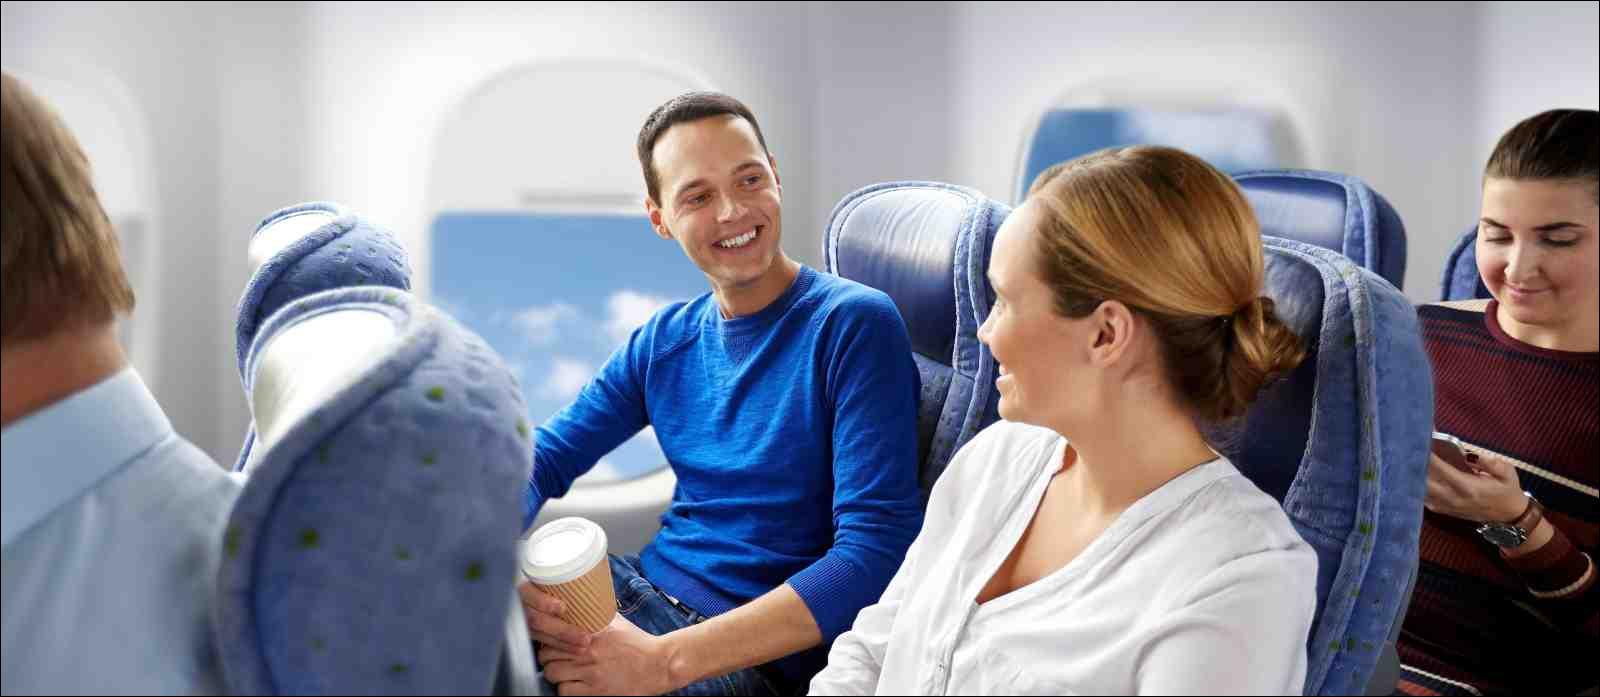 passengers talking during flight